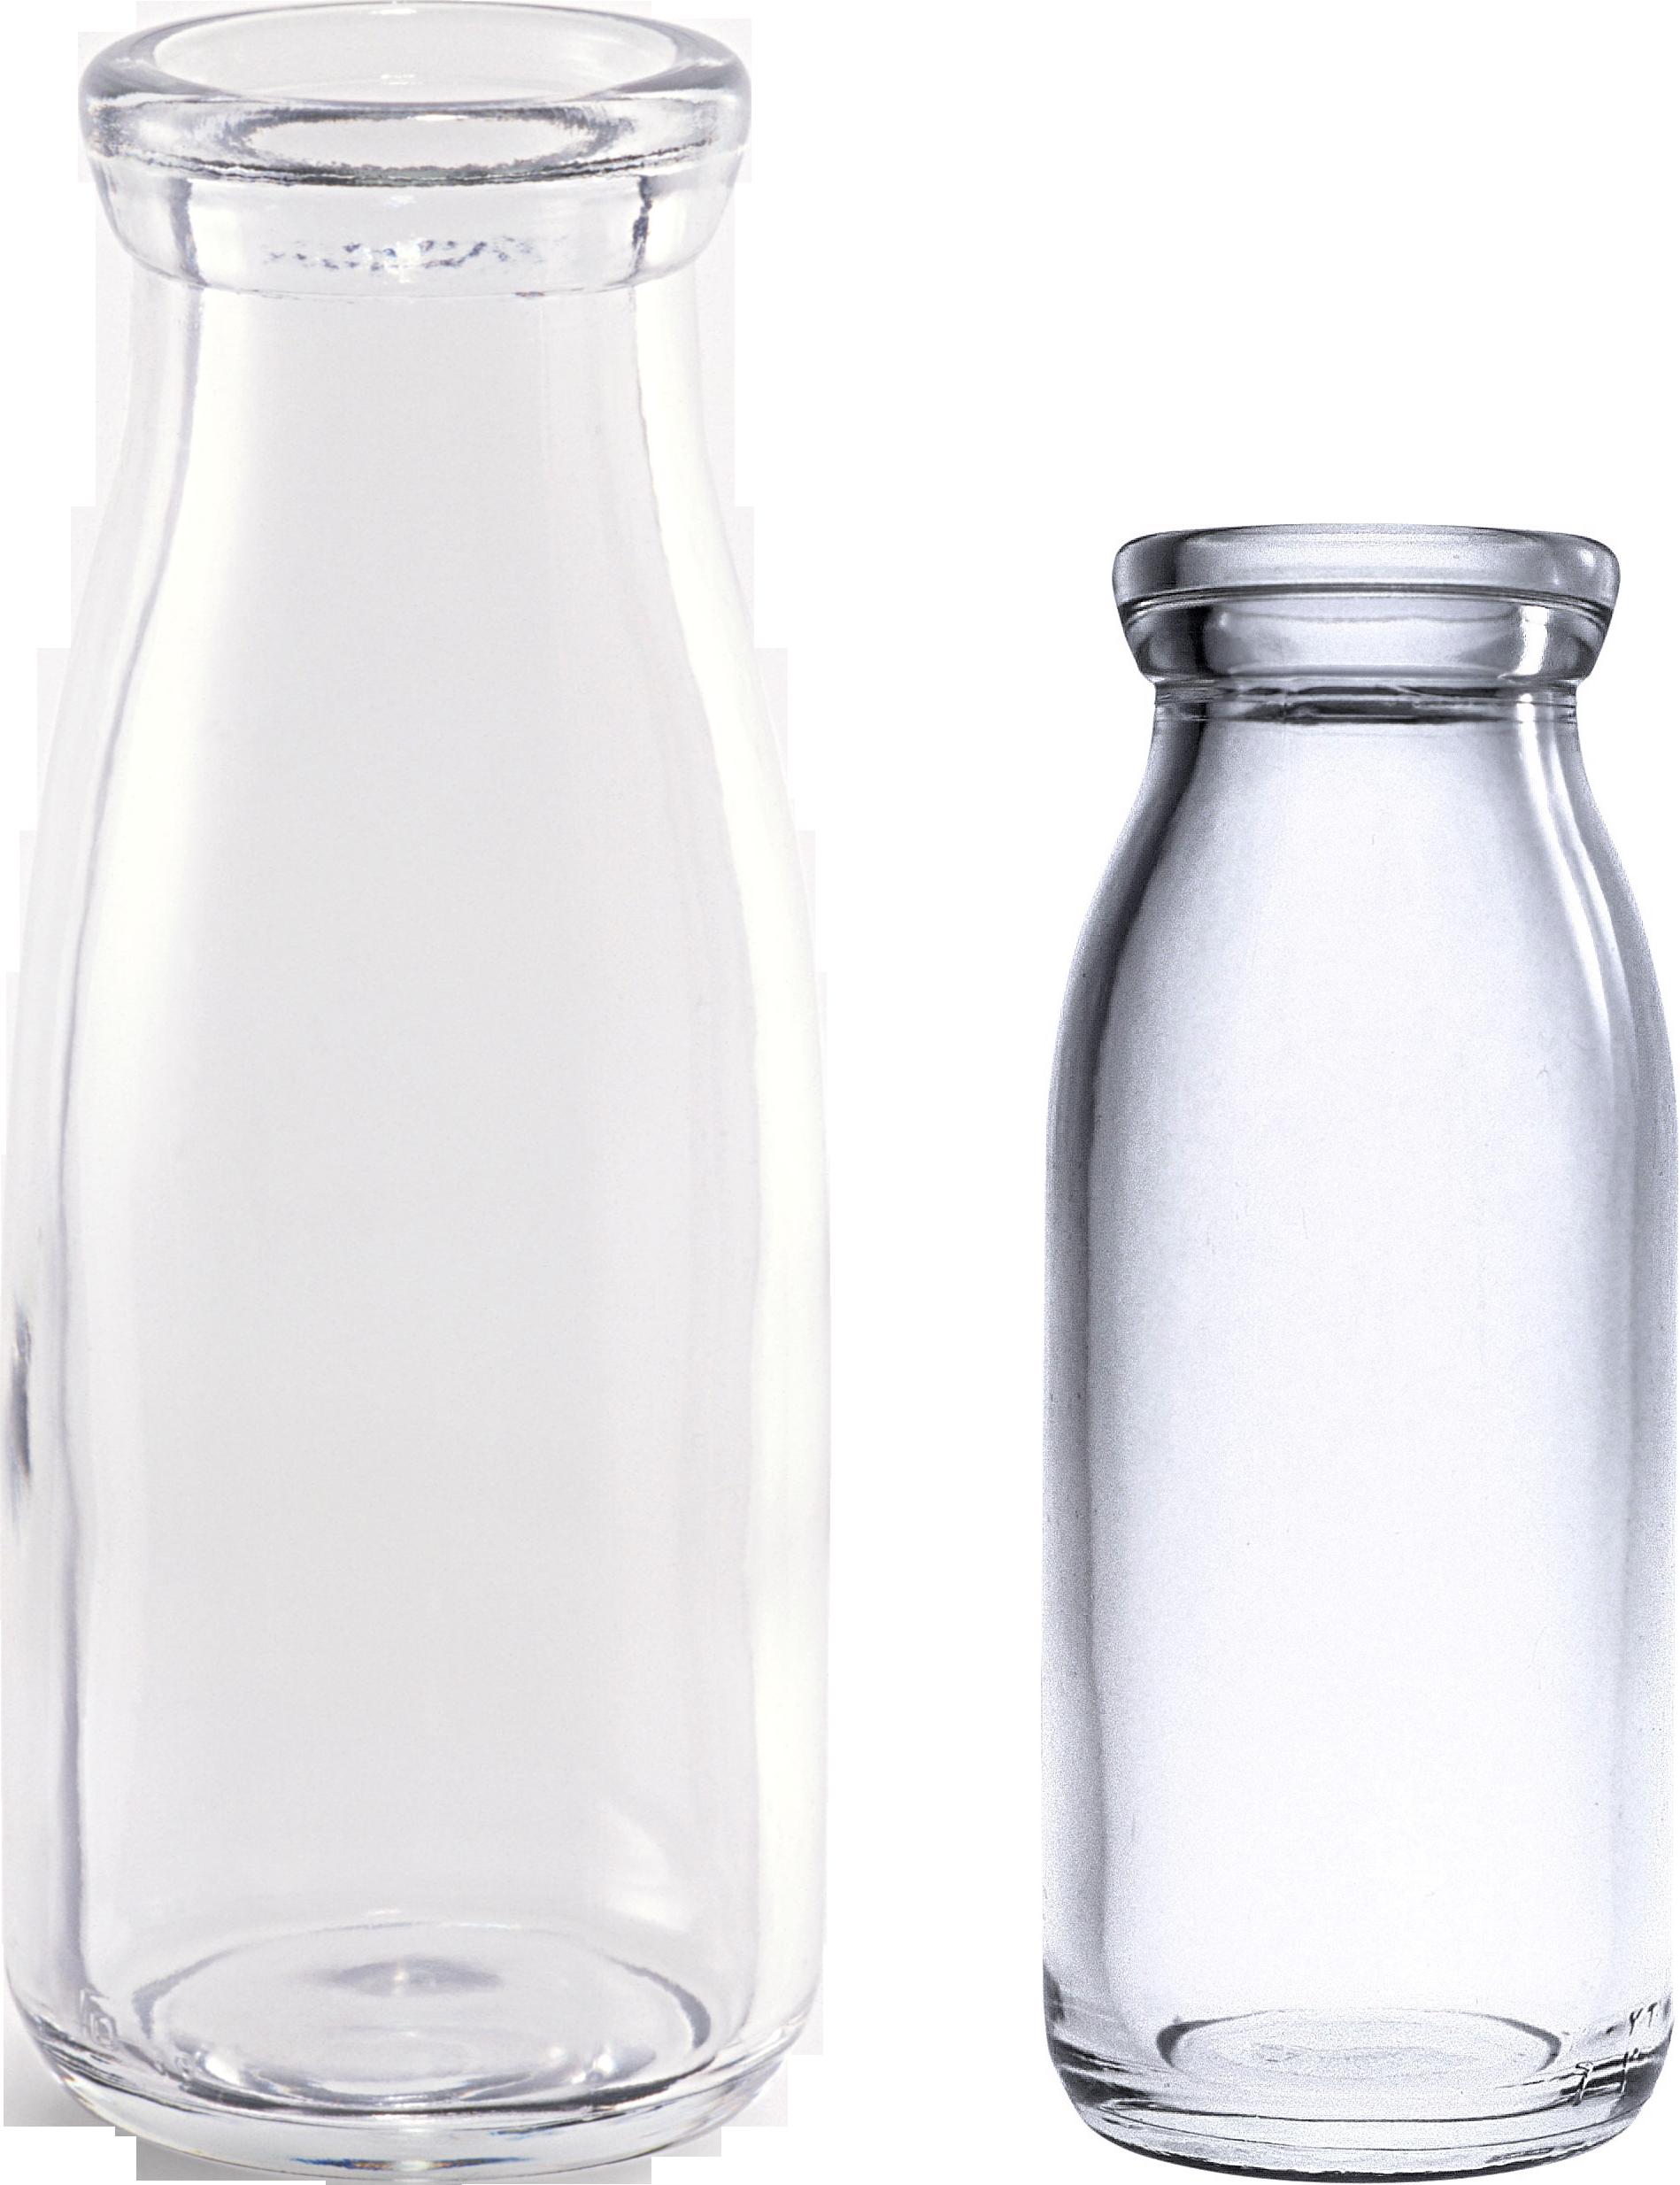 Empty Bottle PNG Image